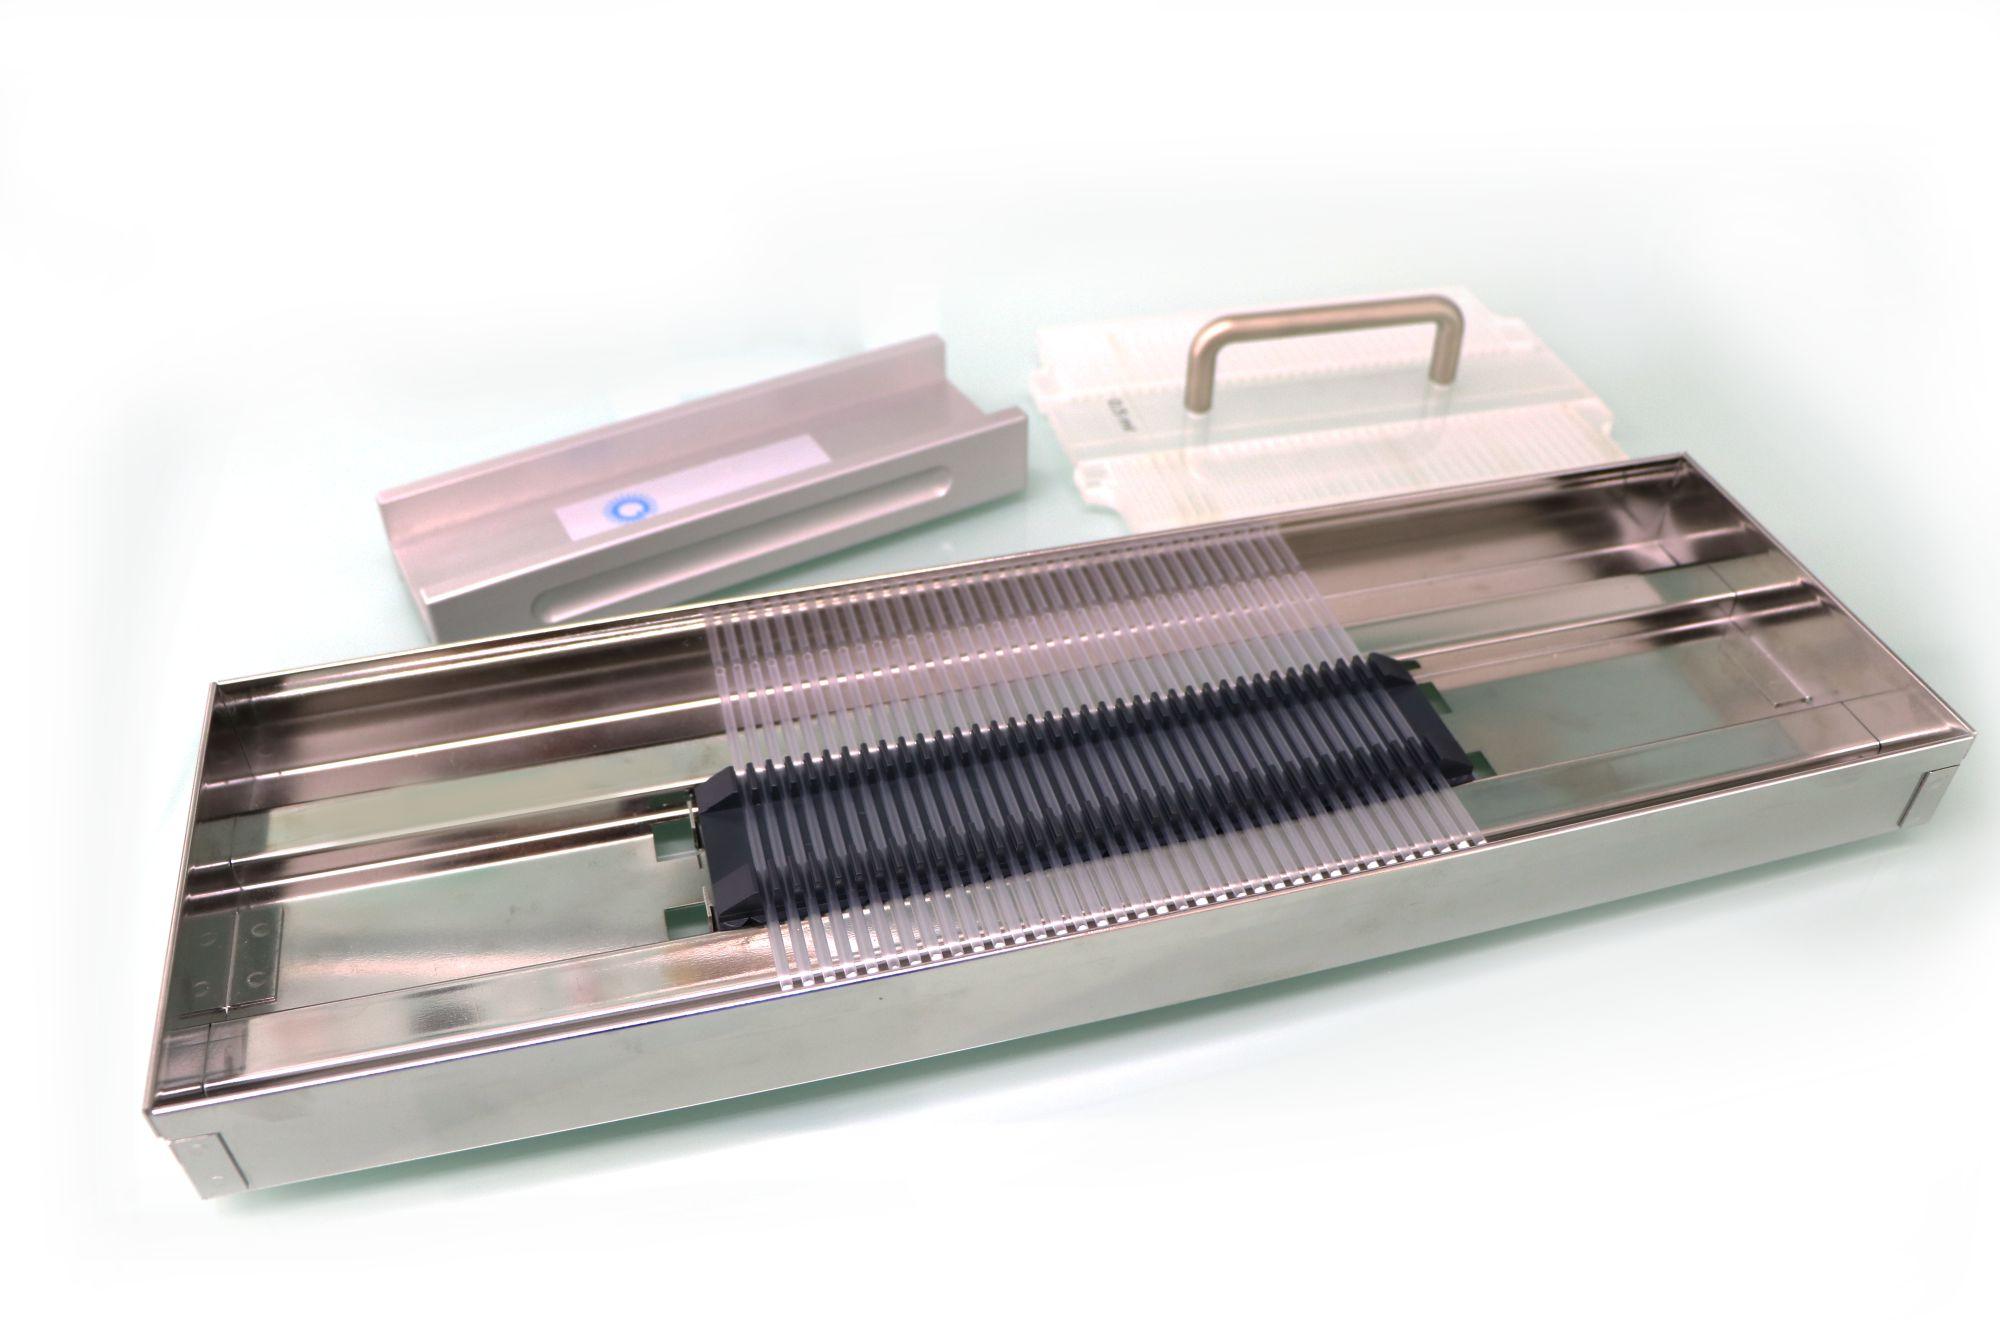 sfs cartridge loader for 05 ml straws